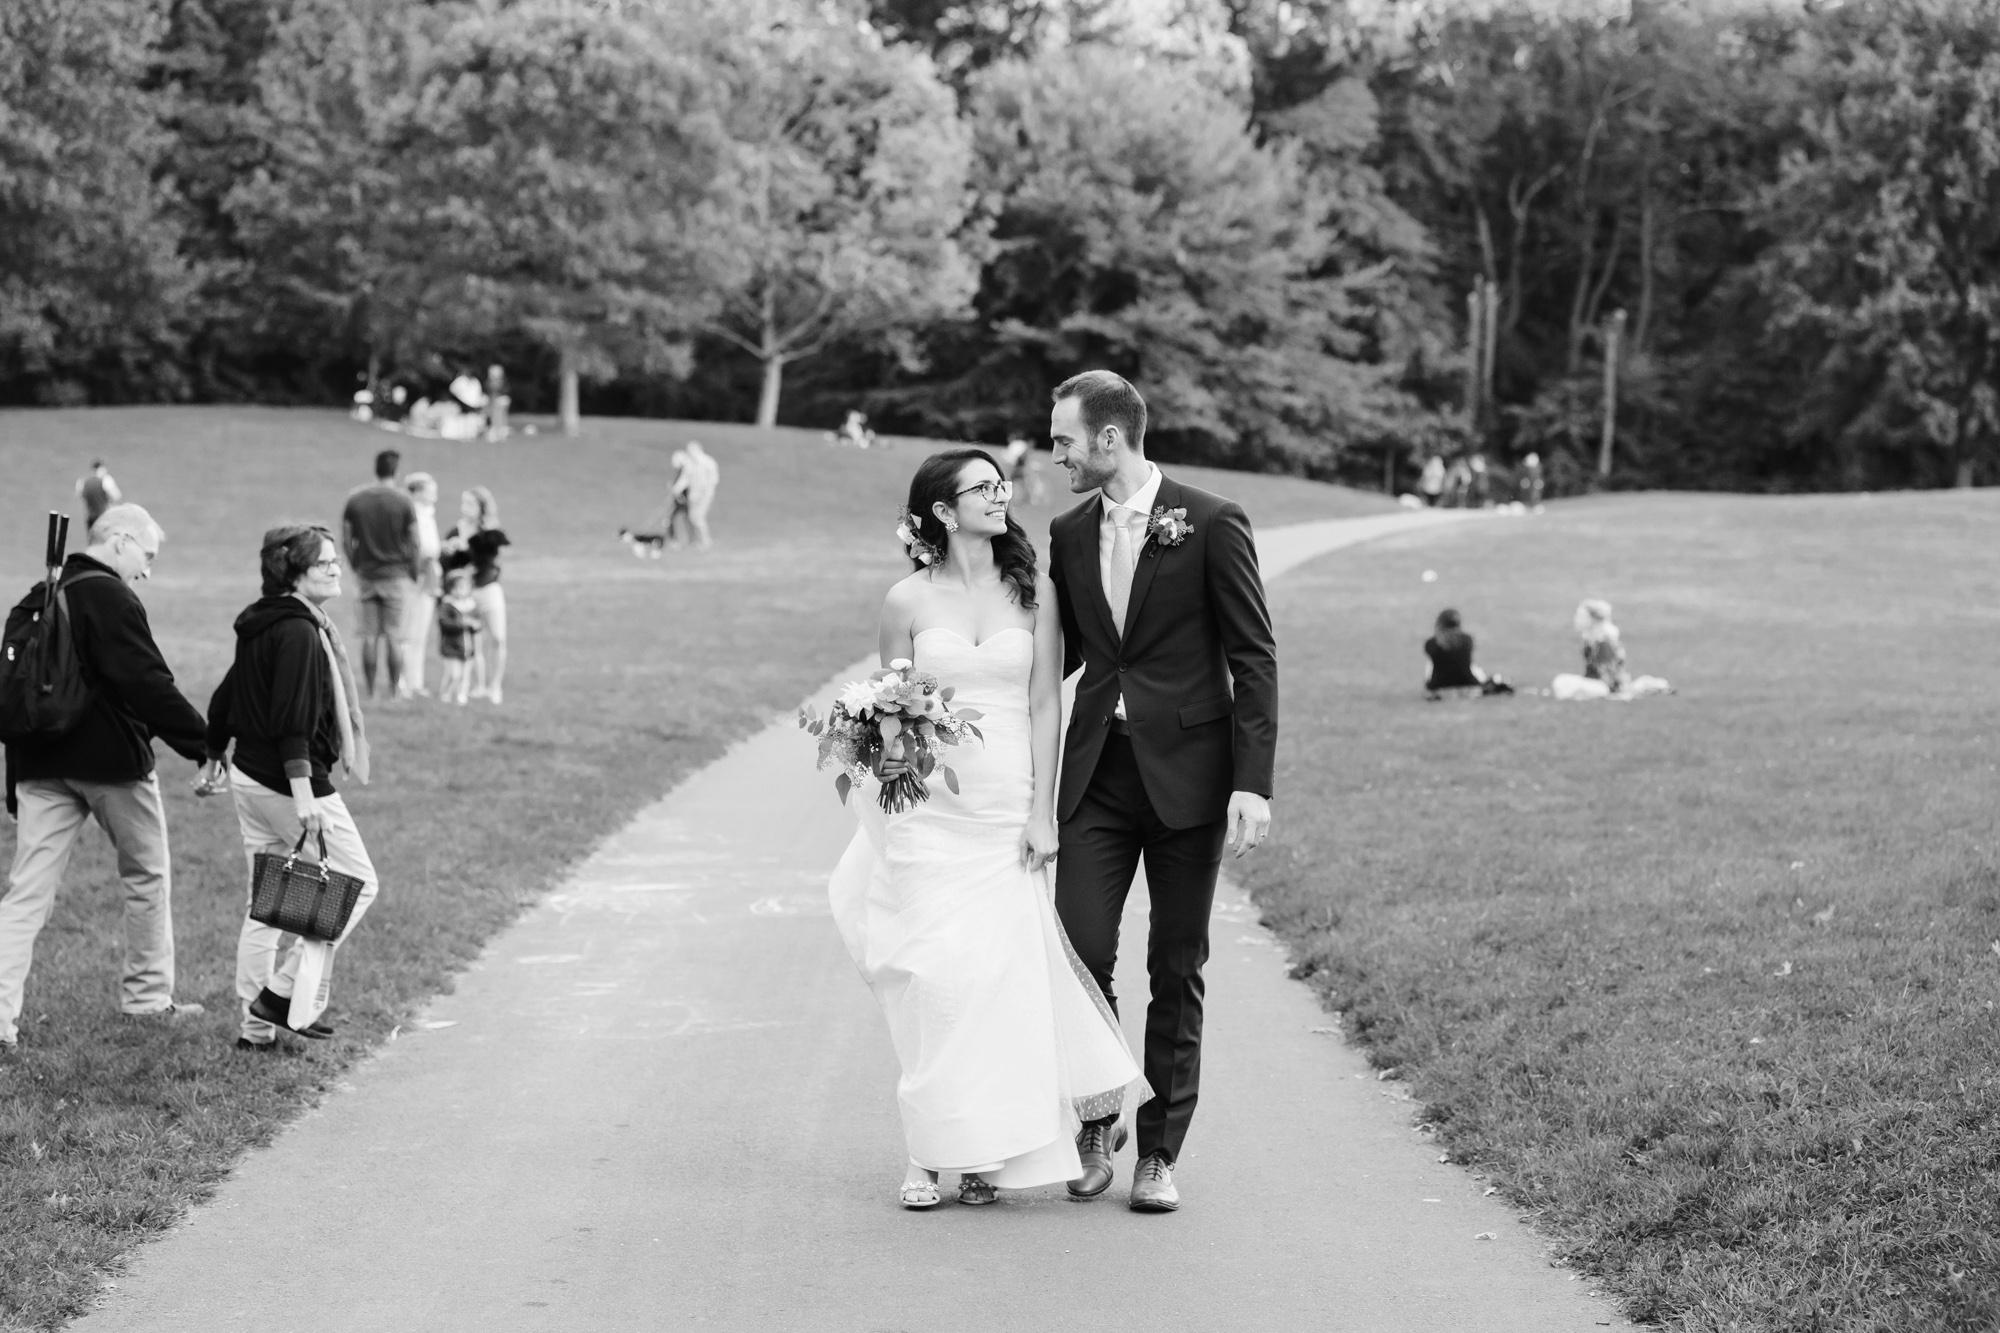 01_Kate_Sam_Picnic_House_Wedding_Brooklyn_NY_Tanya_Salazar_Photography_352.jpg